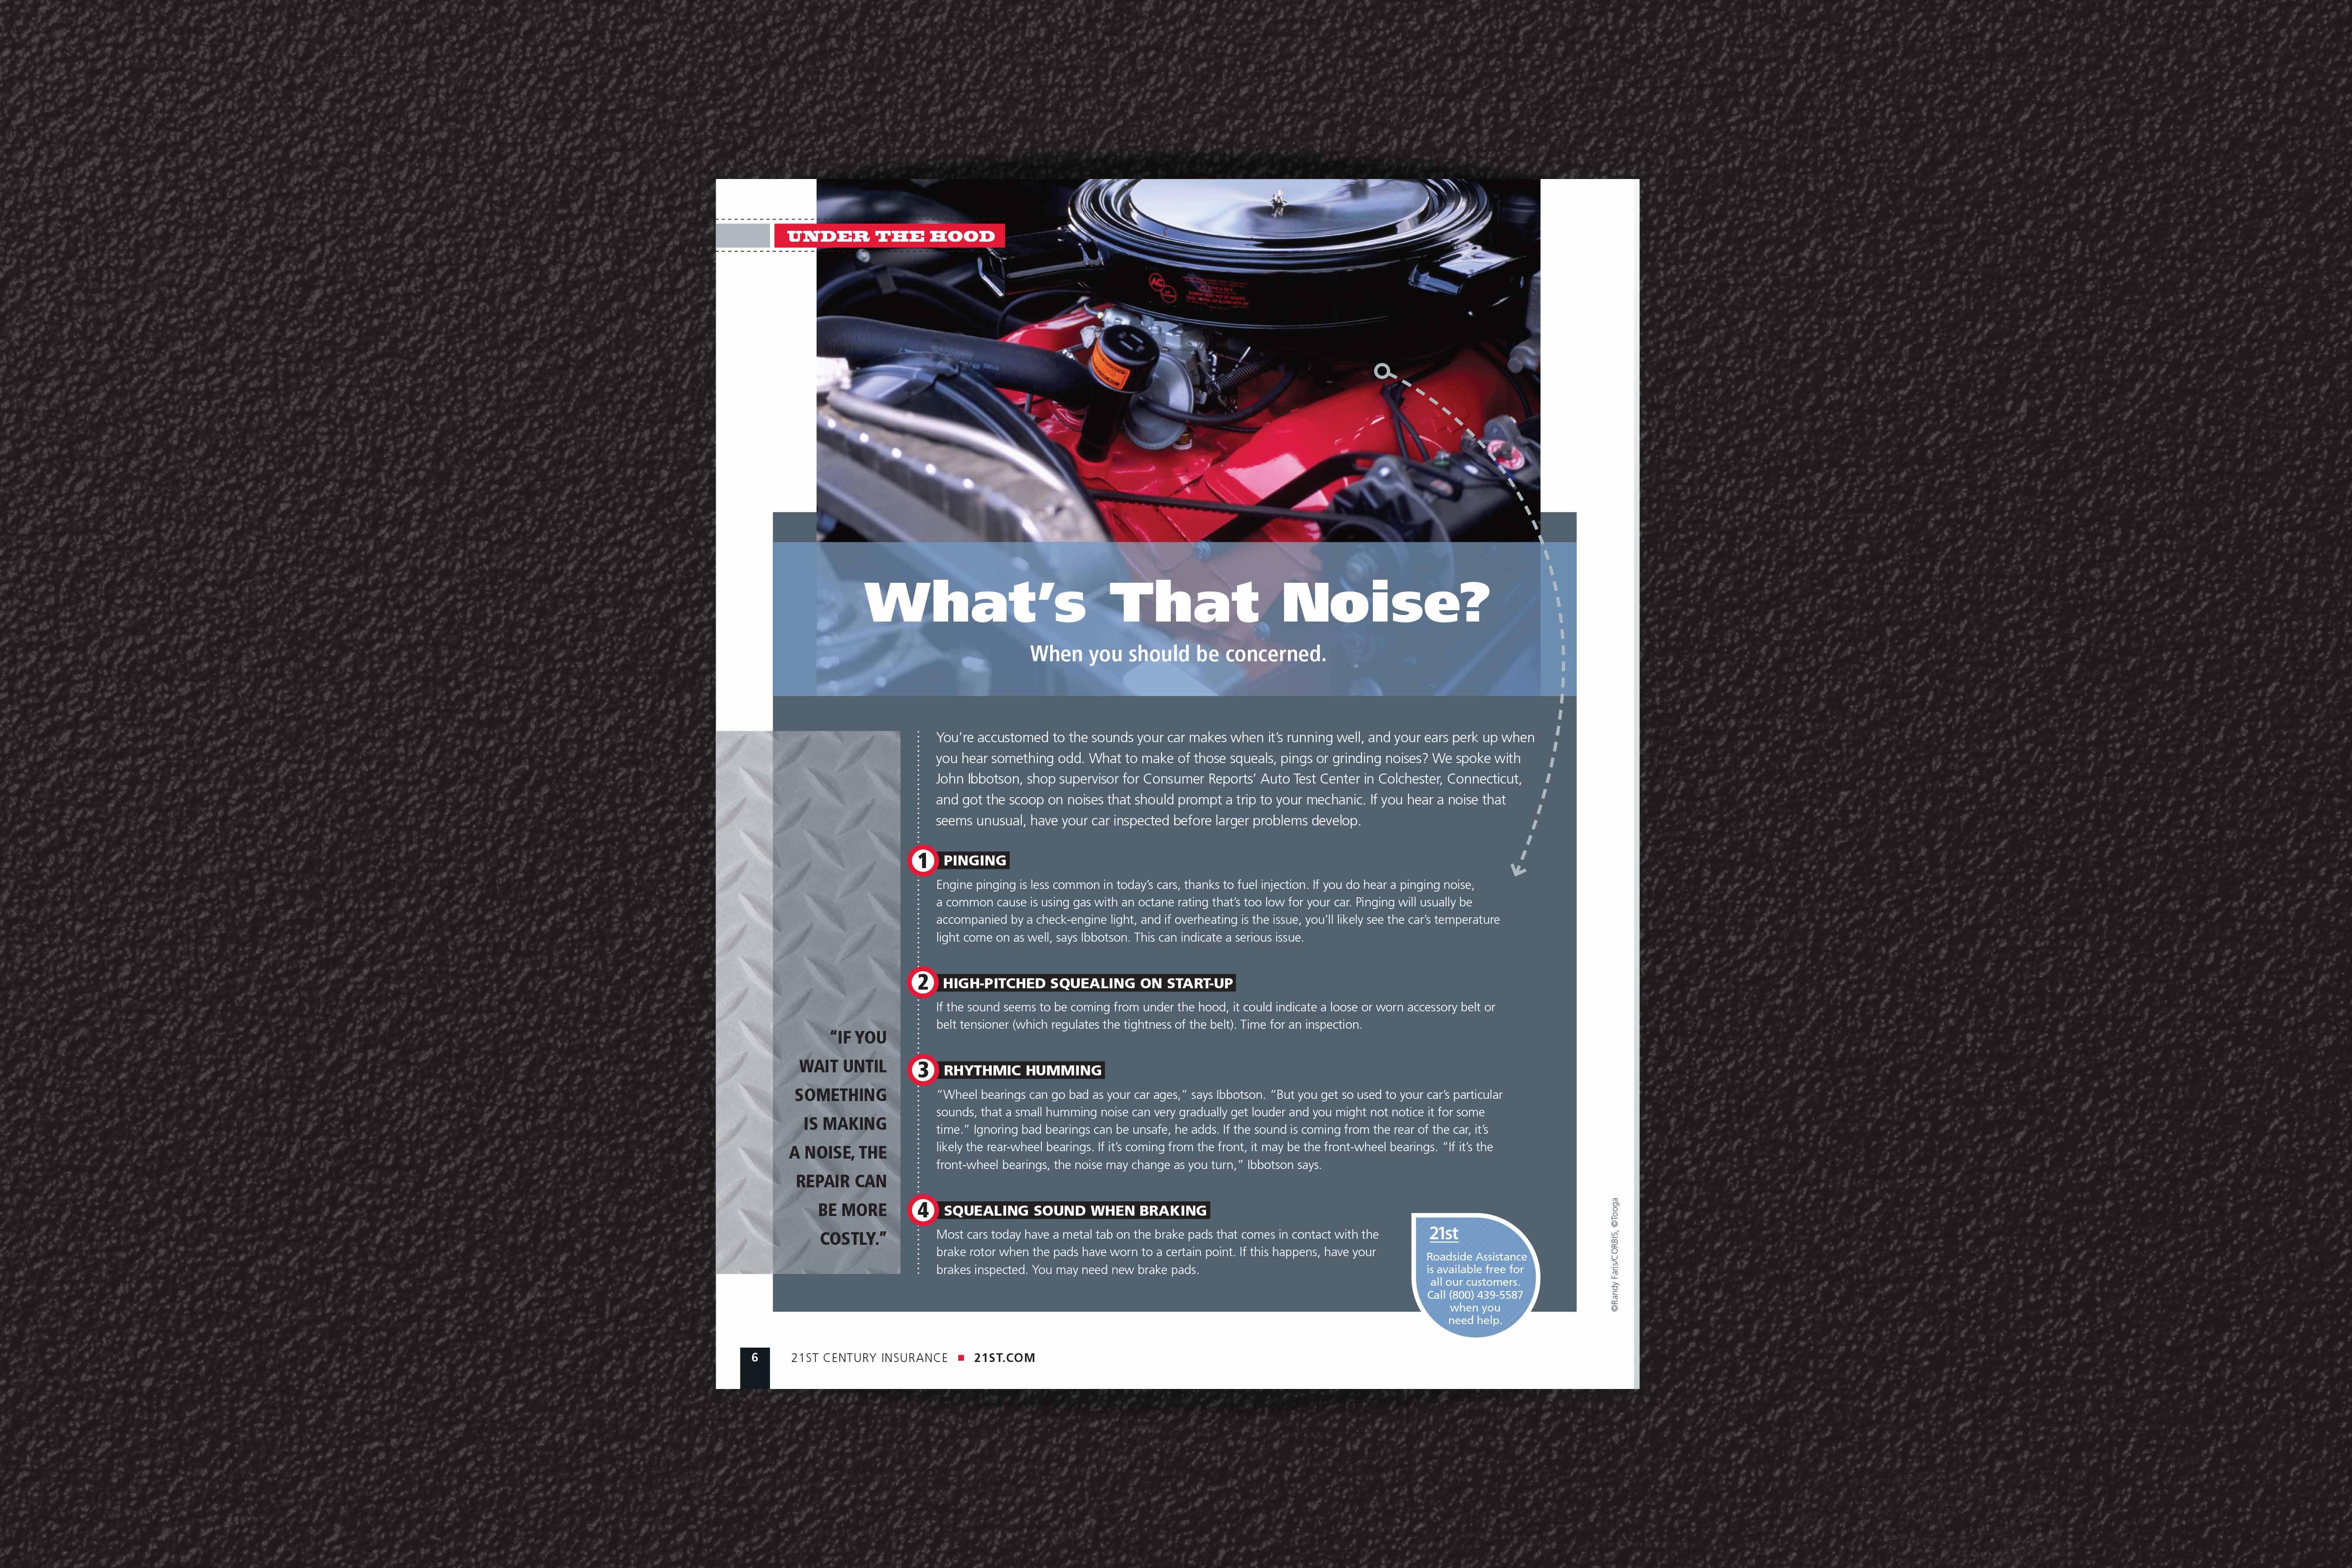 21st Century Magazine